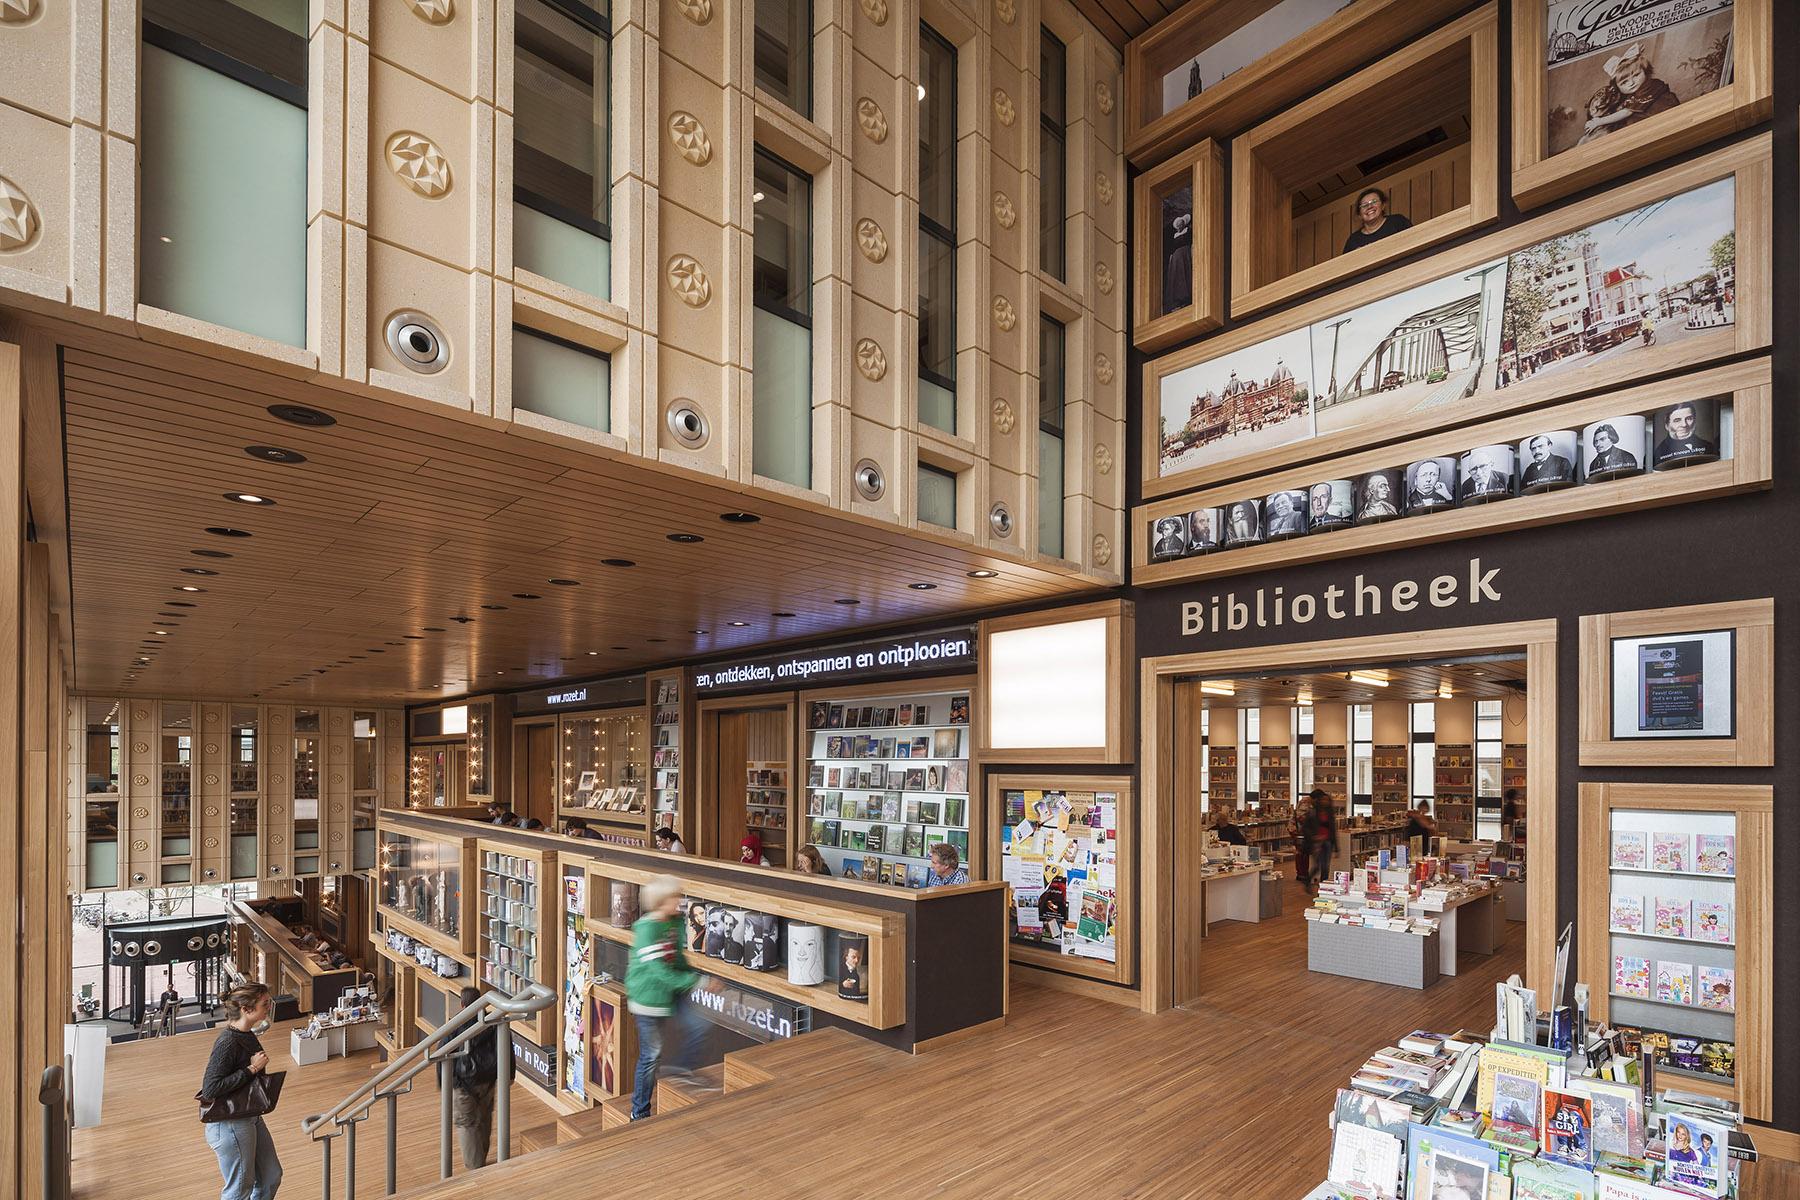 Arnheim Shopping file rozet neutelings riedijk architecten foto scagliola brakkee